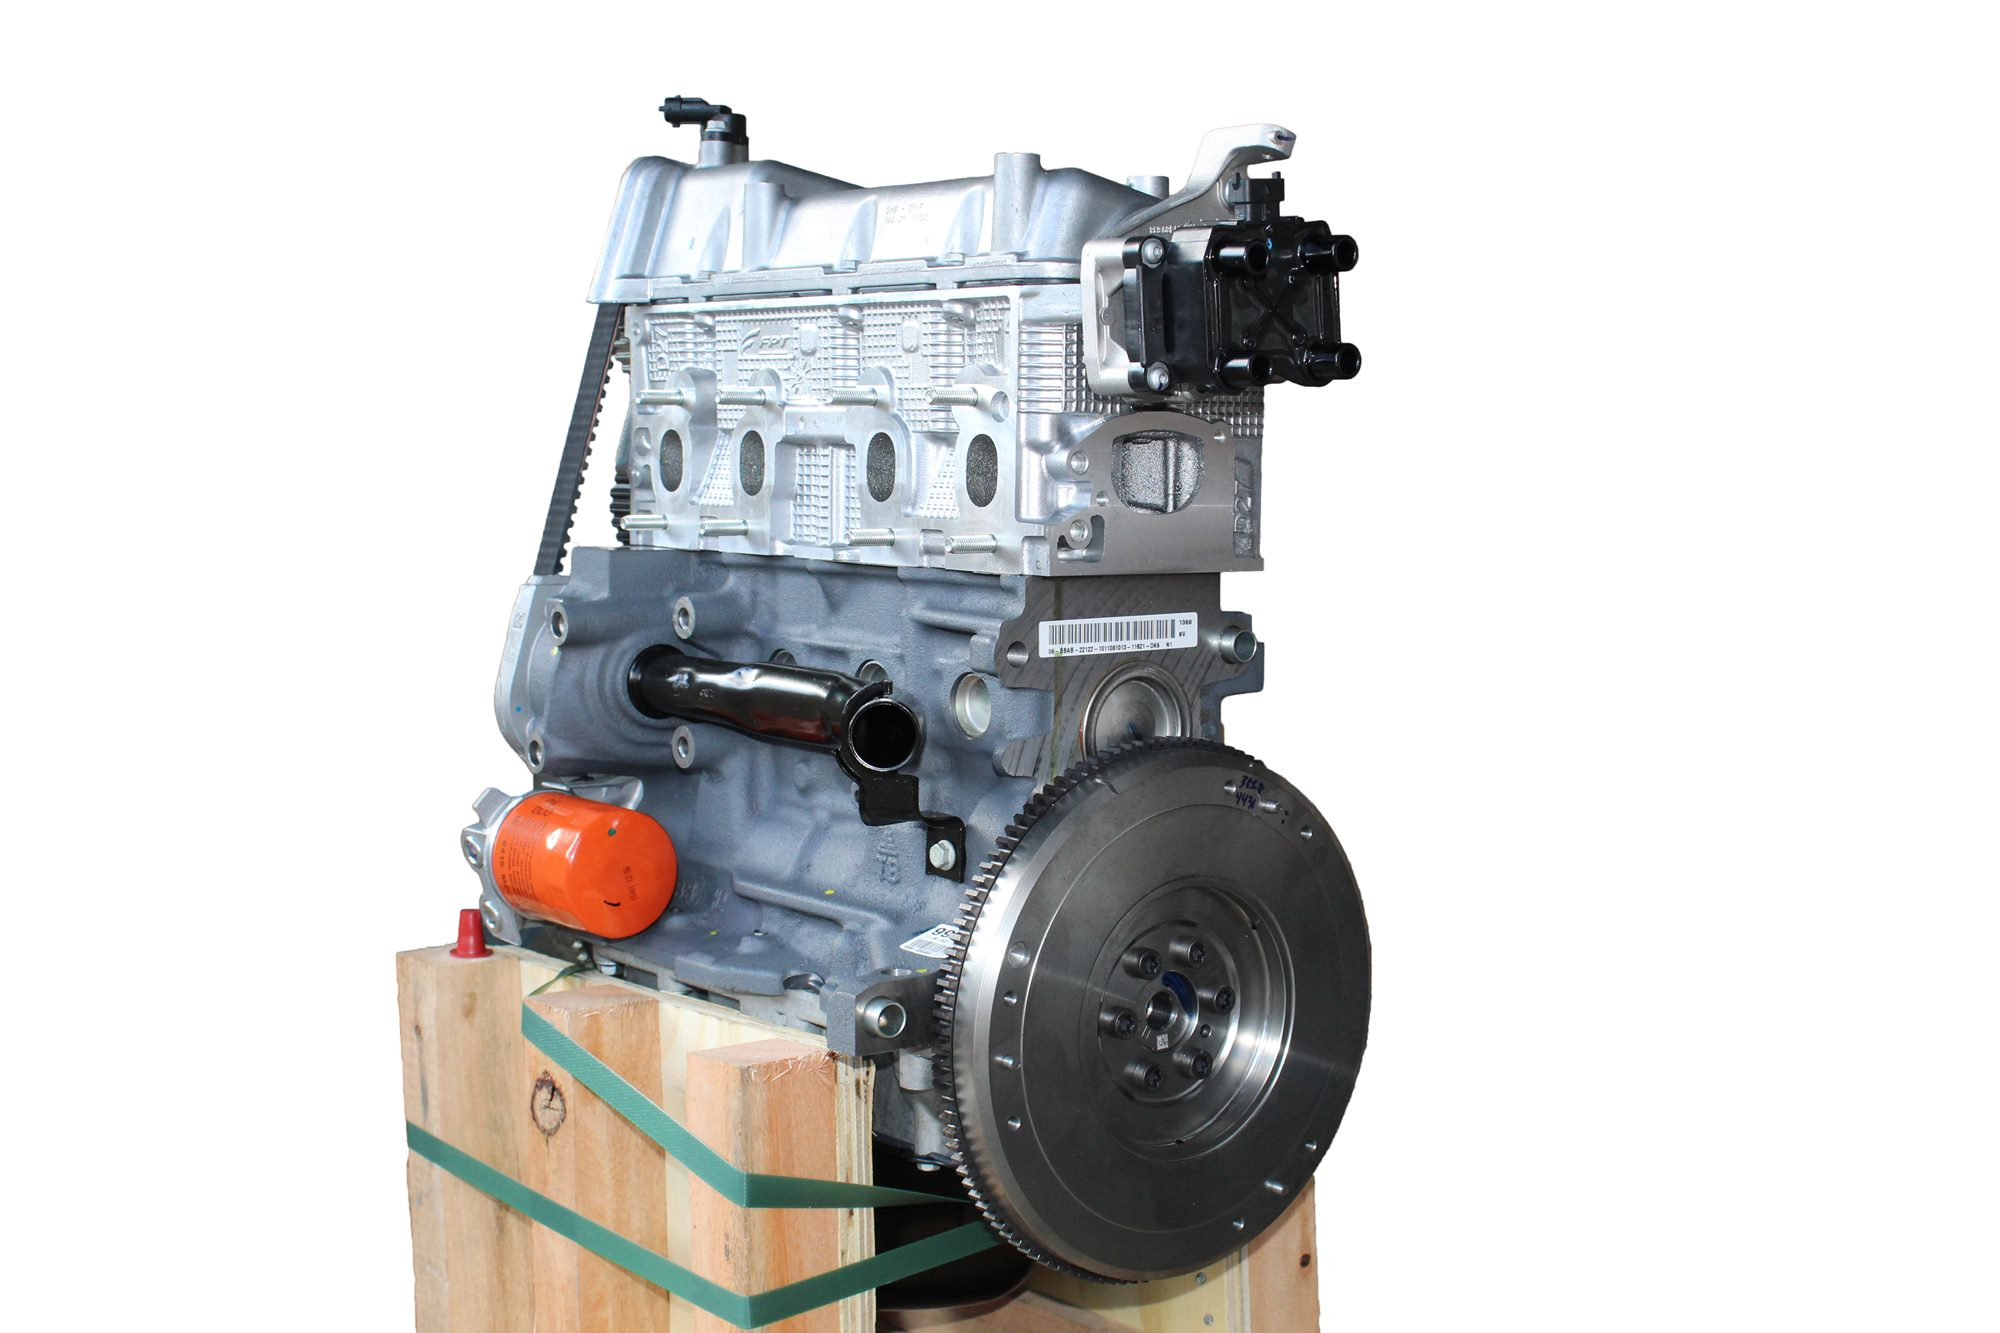 MOTOR SEMICOMPLETO 1.4 8V GA C/SUB-BLOCO - Cód. 55224801